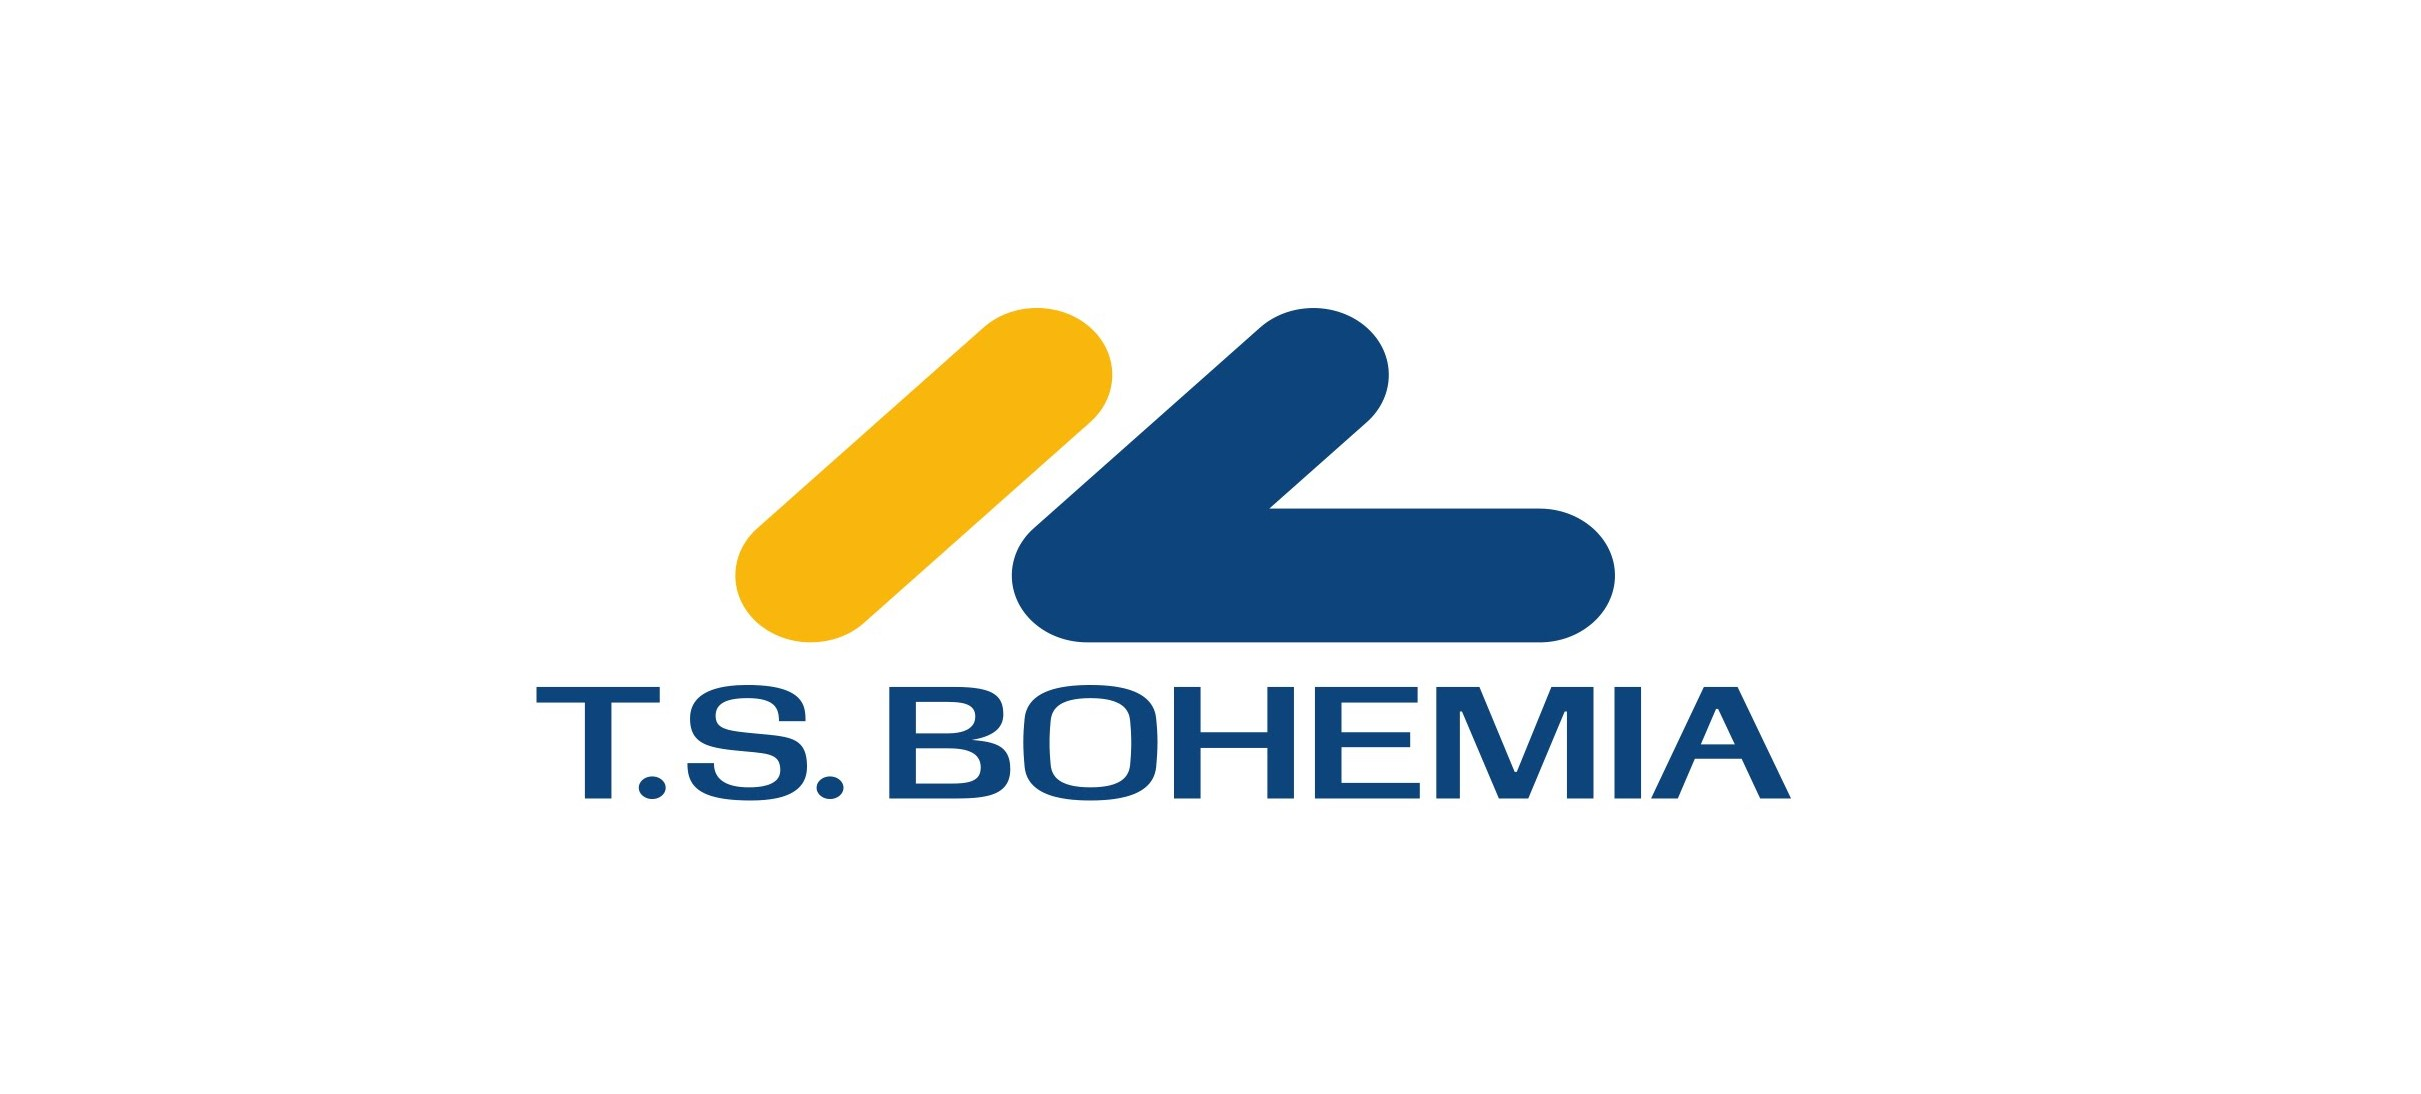 channel_1529412308bohemia_final.jpg